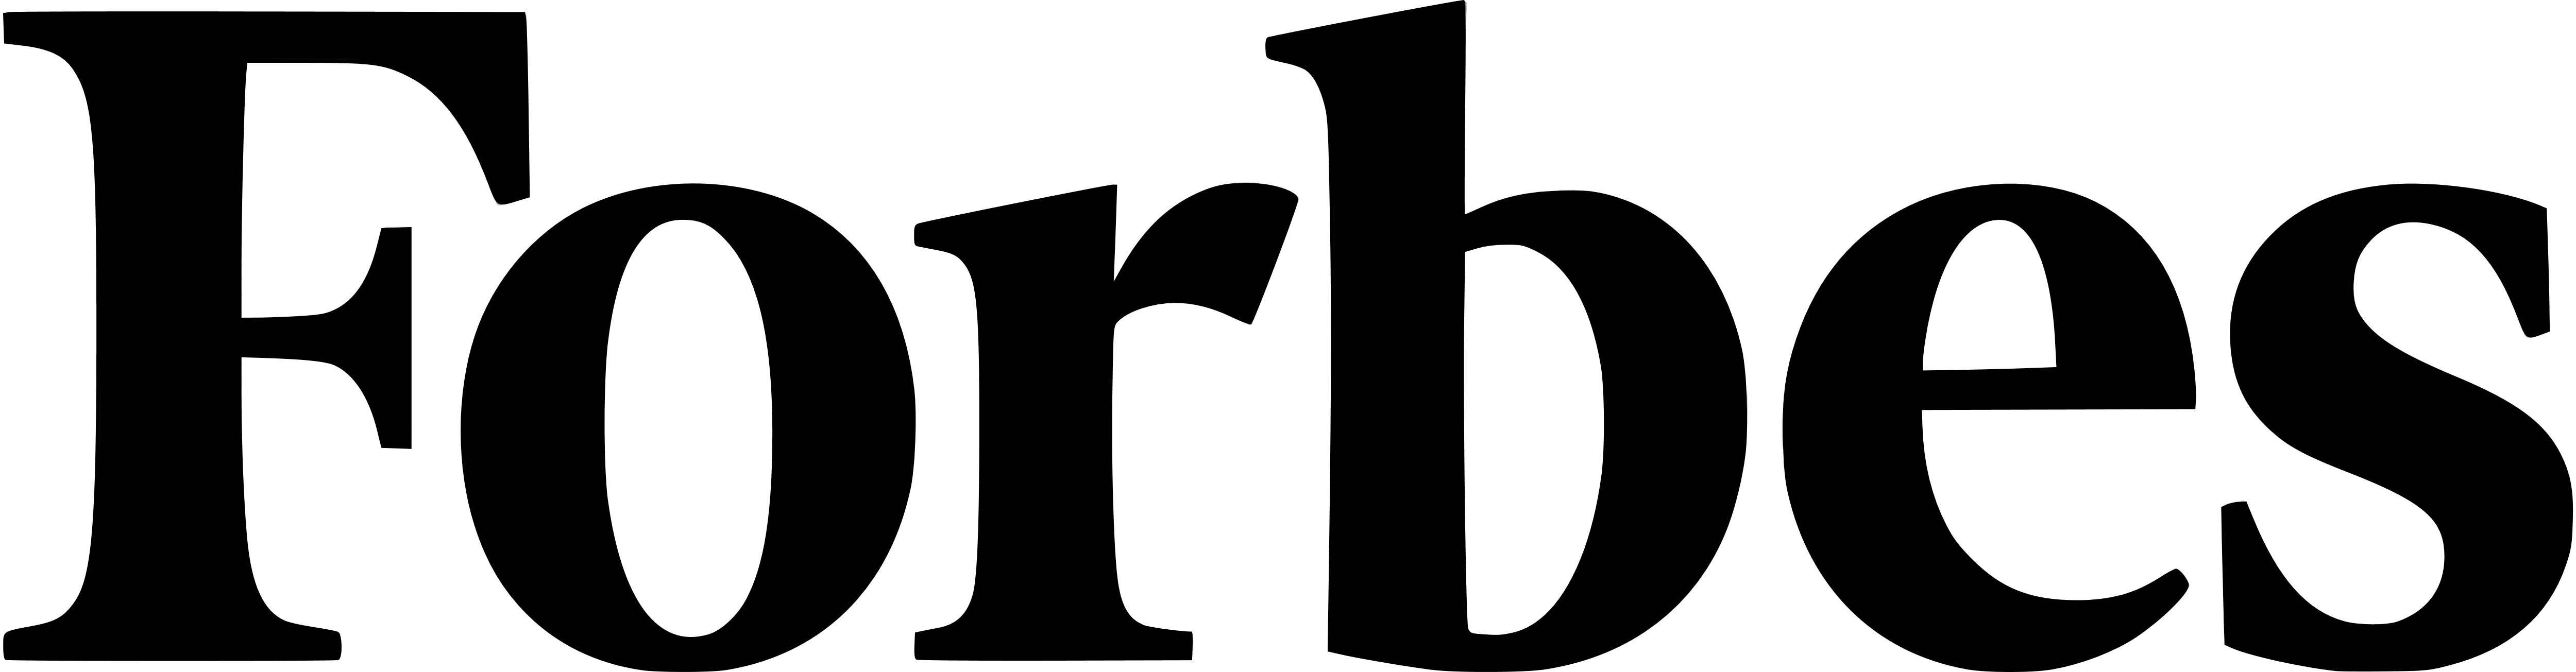 http://sabrinaphilipp.com/wp-content/uploads/2018/02/Forbes_logo_black.png